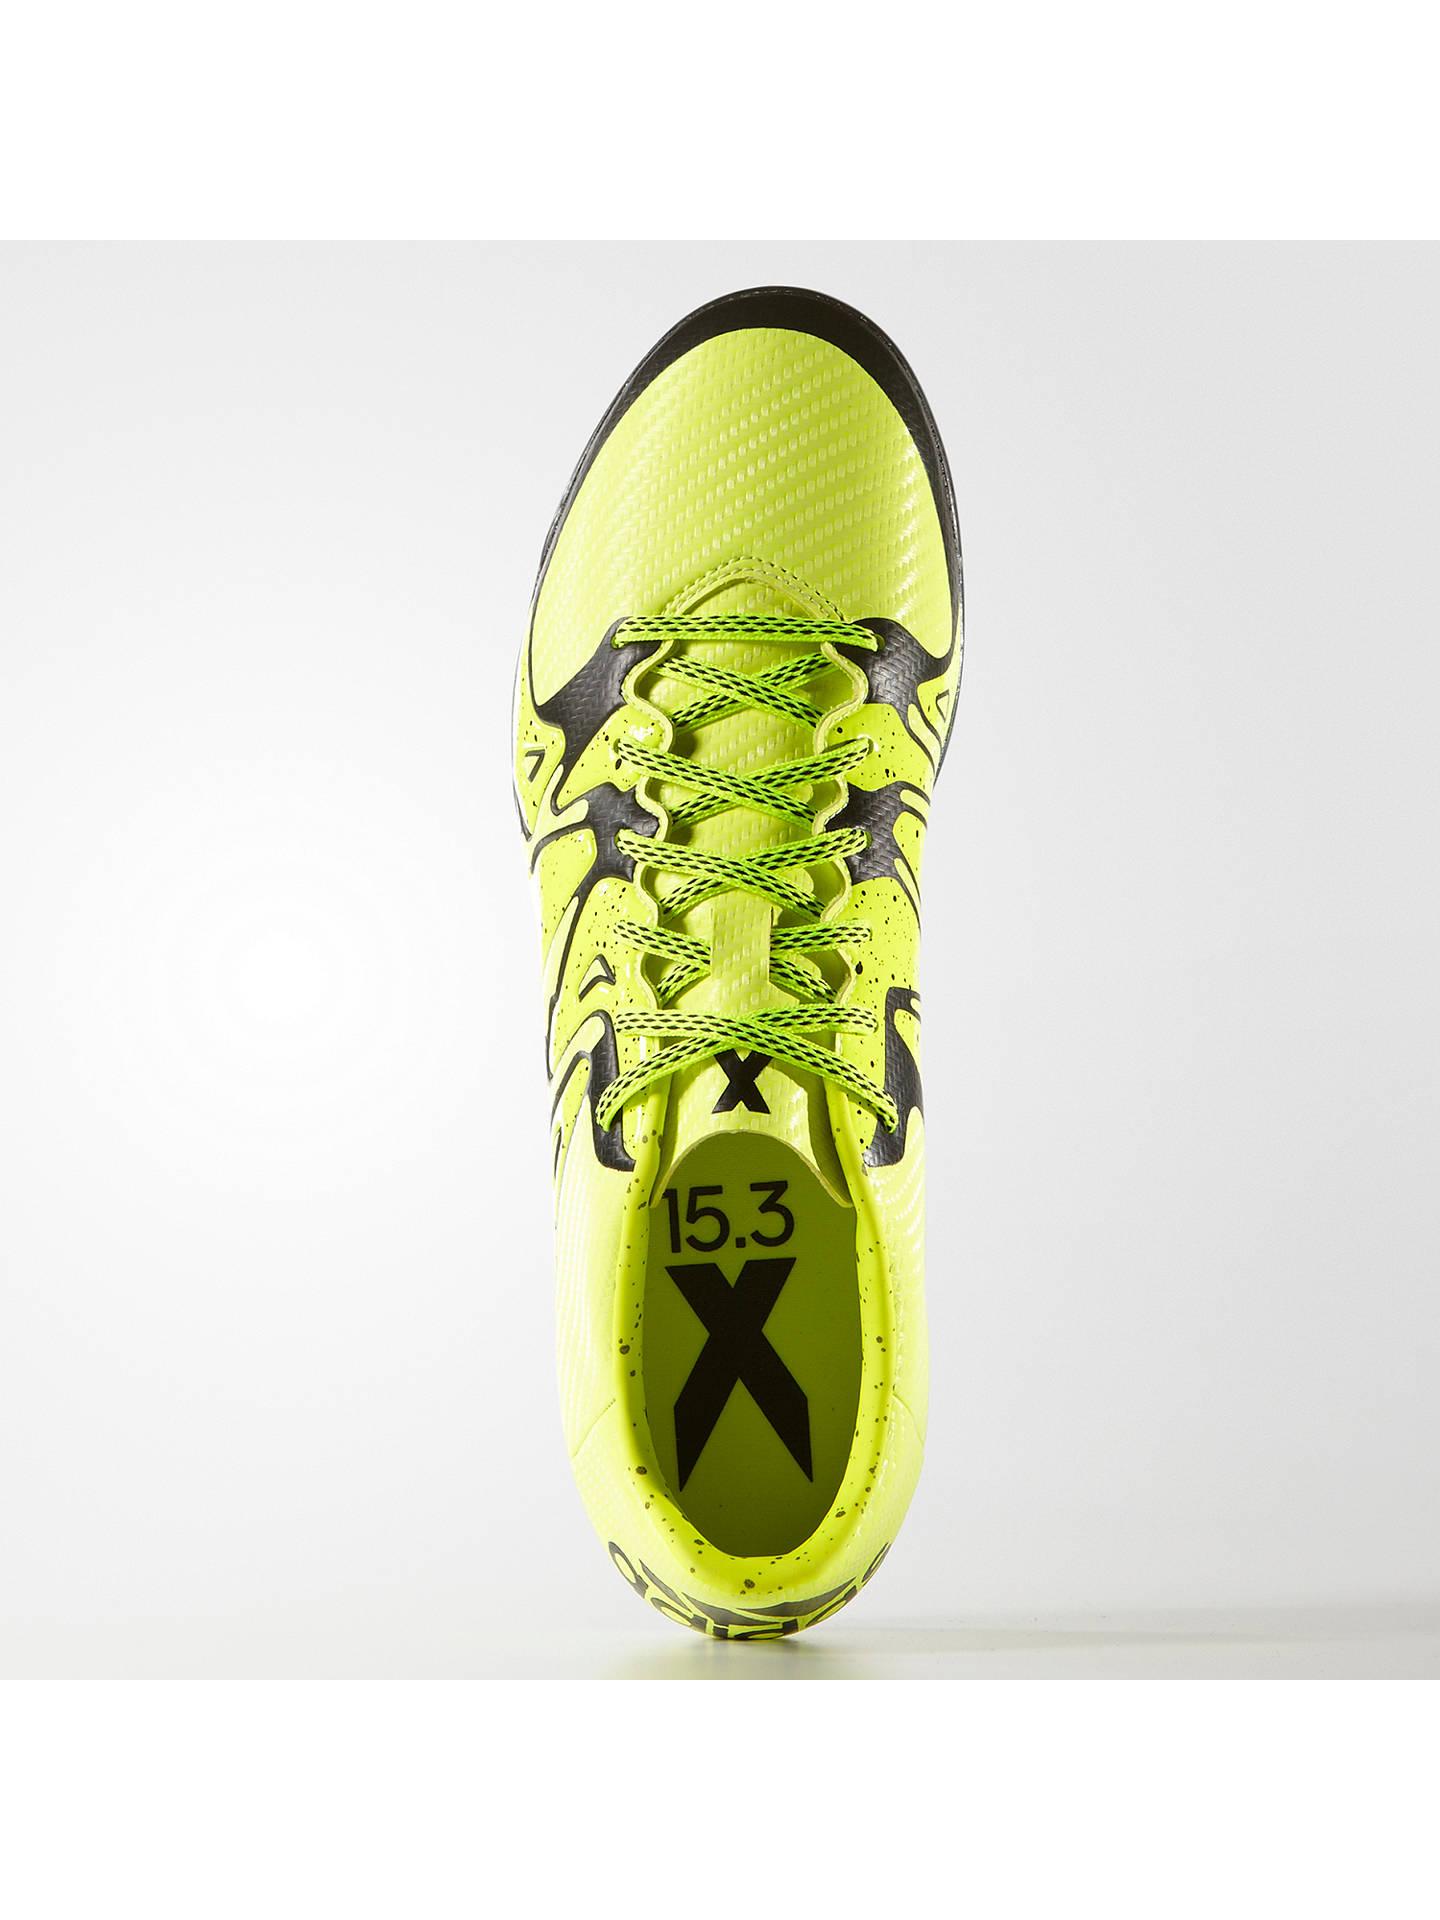 7d0457c09559 ... Buy Adidas X15.3 TF FG Football Shoes